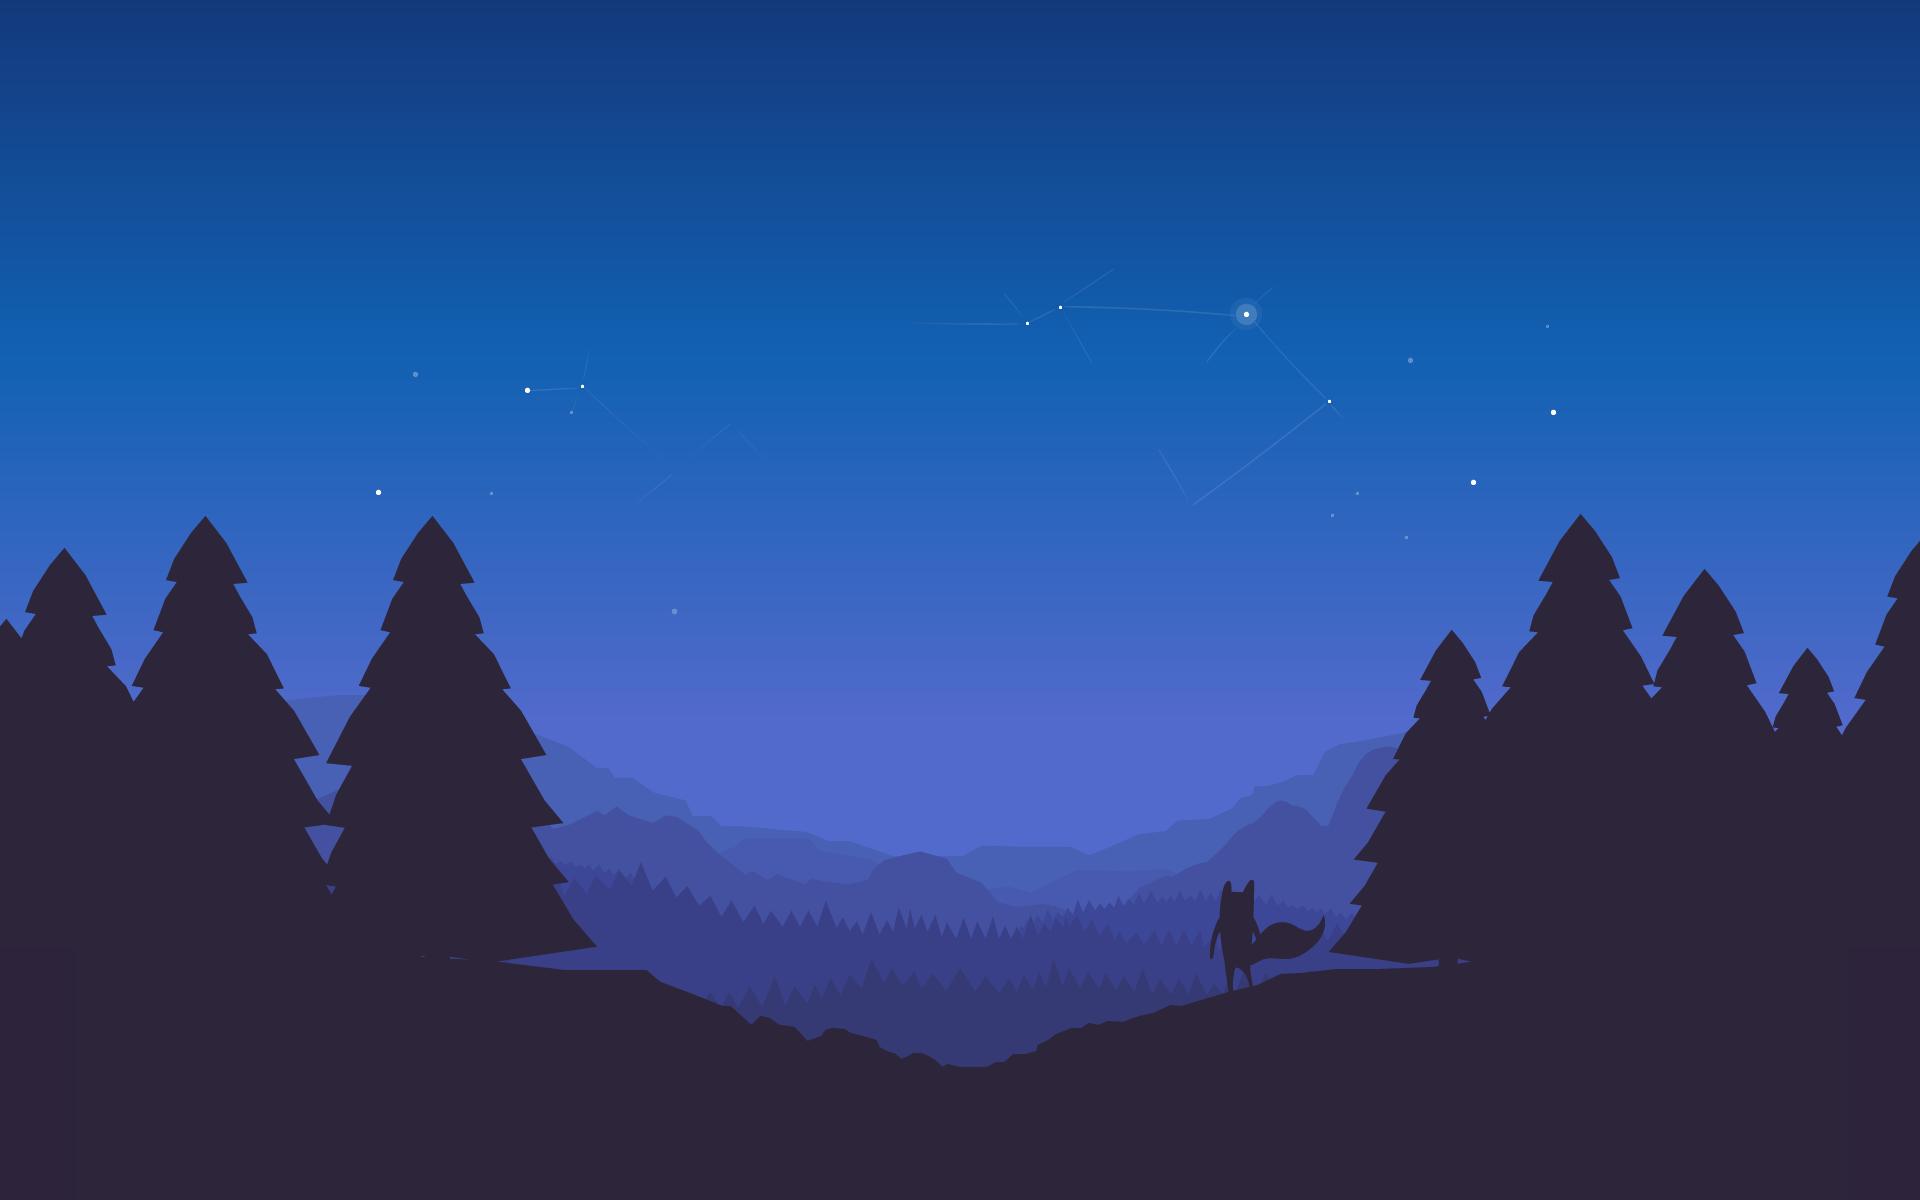 wallpaper : mozilla firefox, night, forest, landscape, horizon